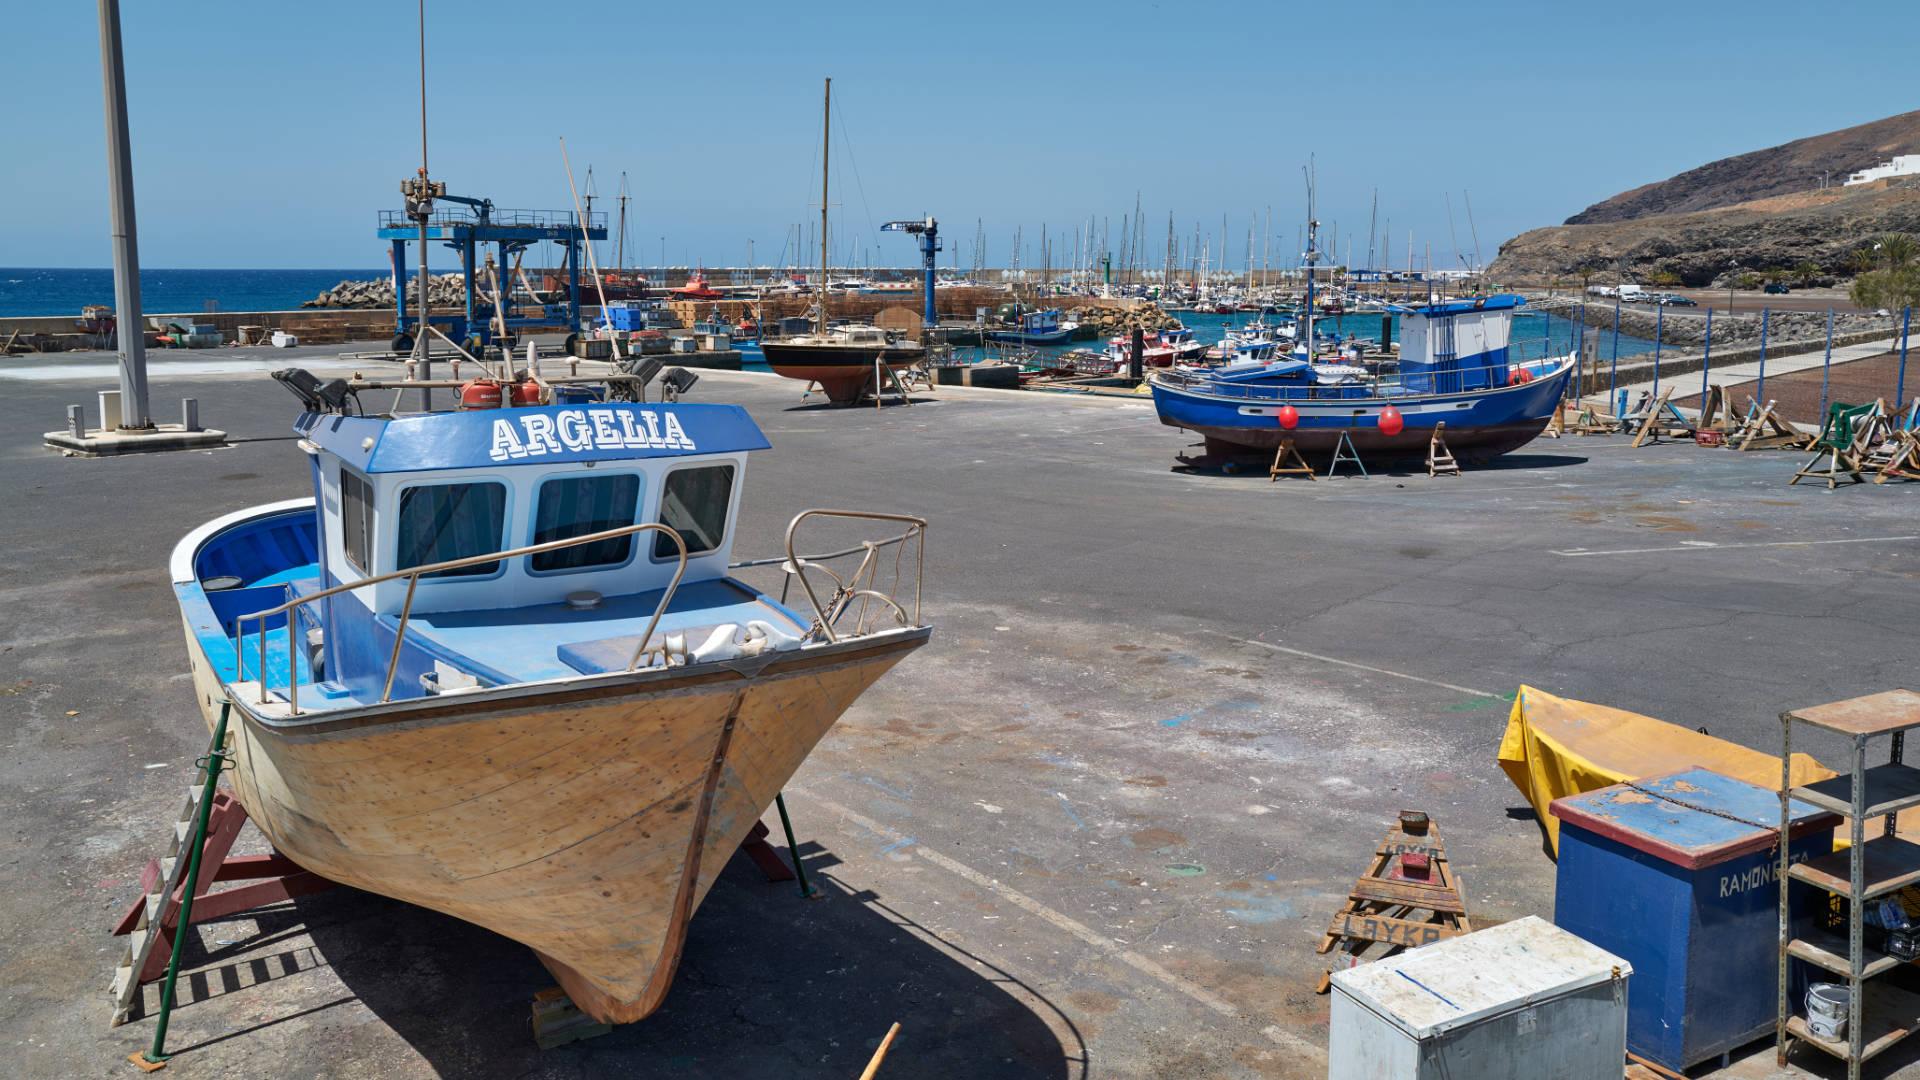 Die Stadt Gran Tarajal auf Fuerteventura.